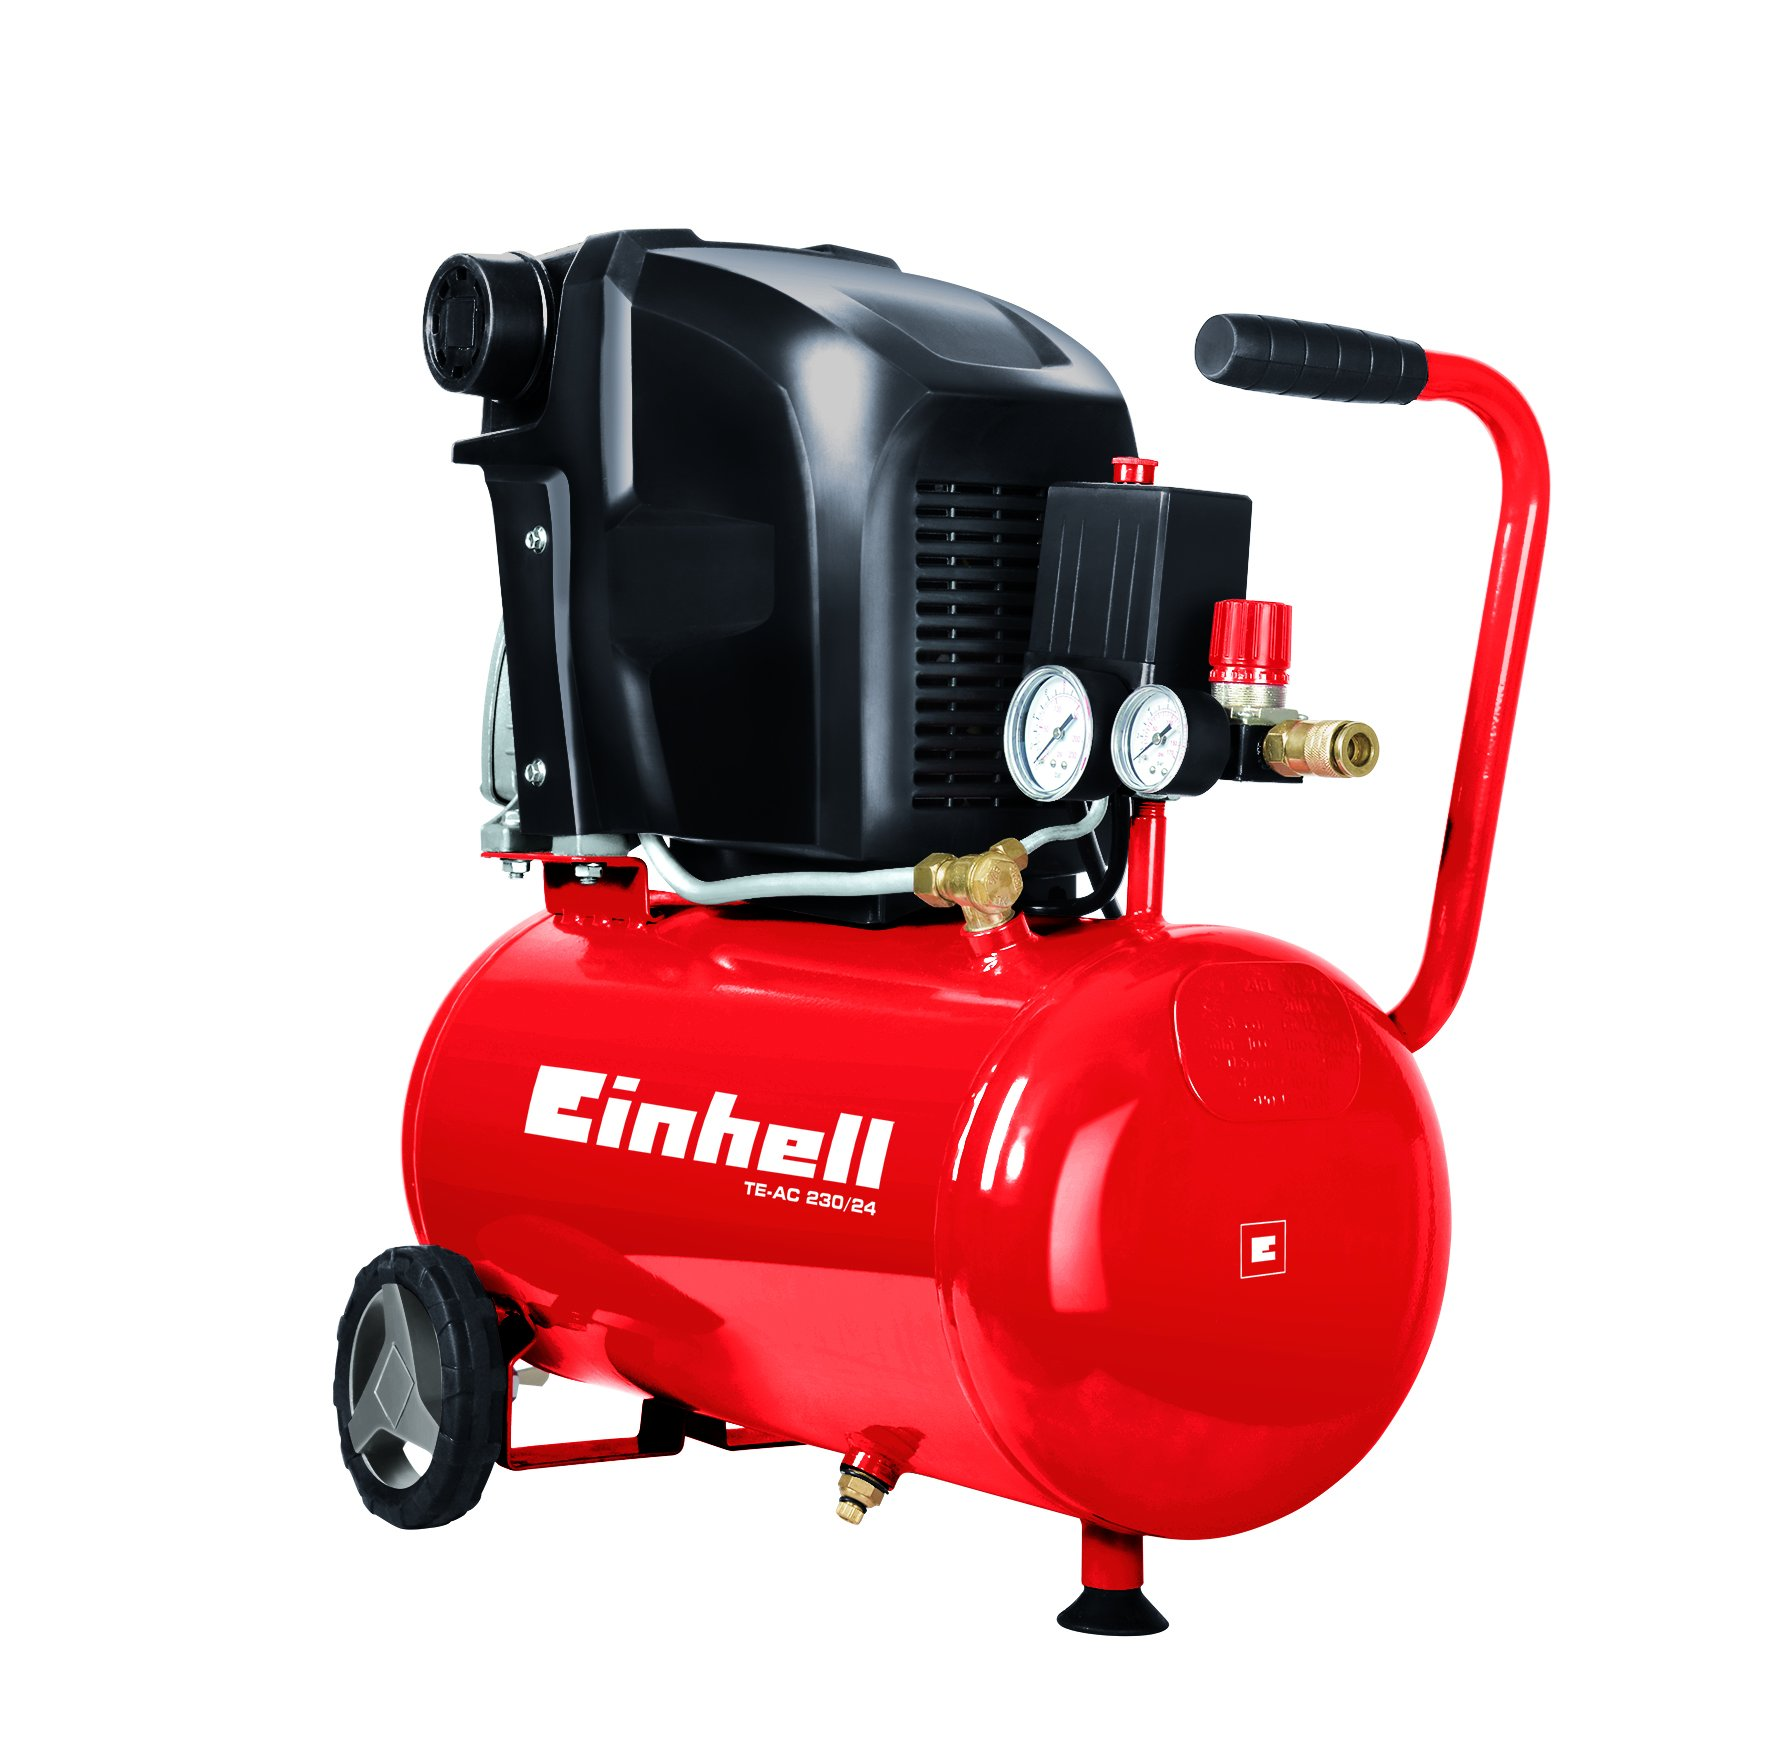 Einhell 4010460 Compresor Expert, 1500 W, 230 V, Rojo, 1 product image